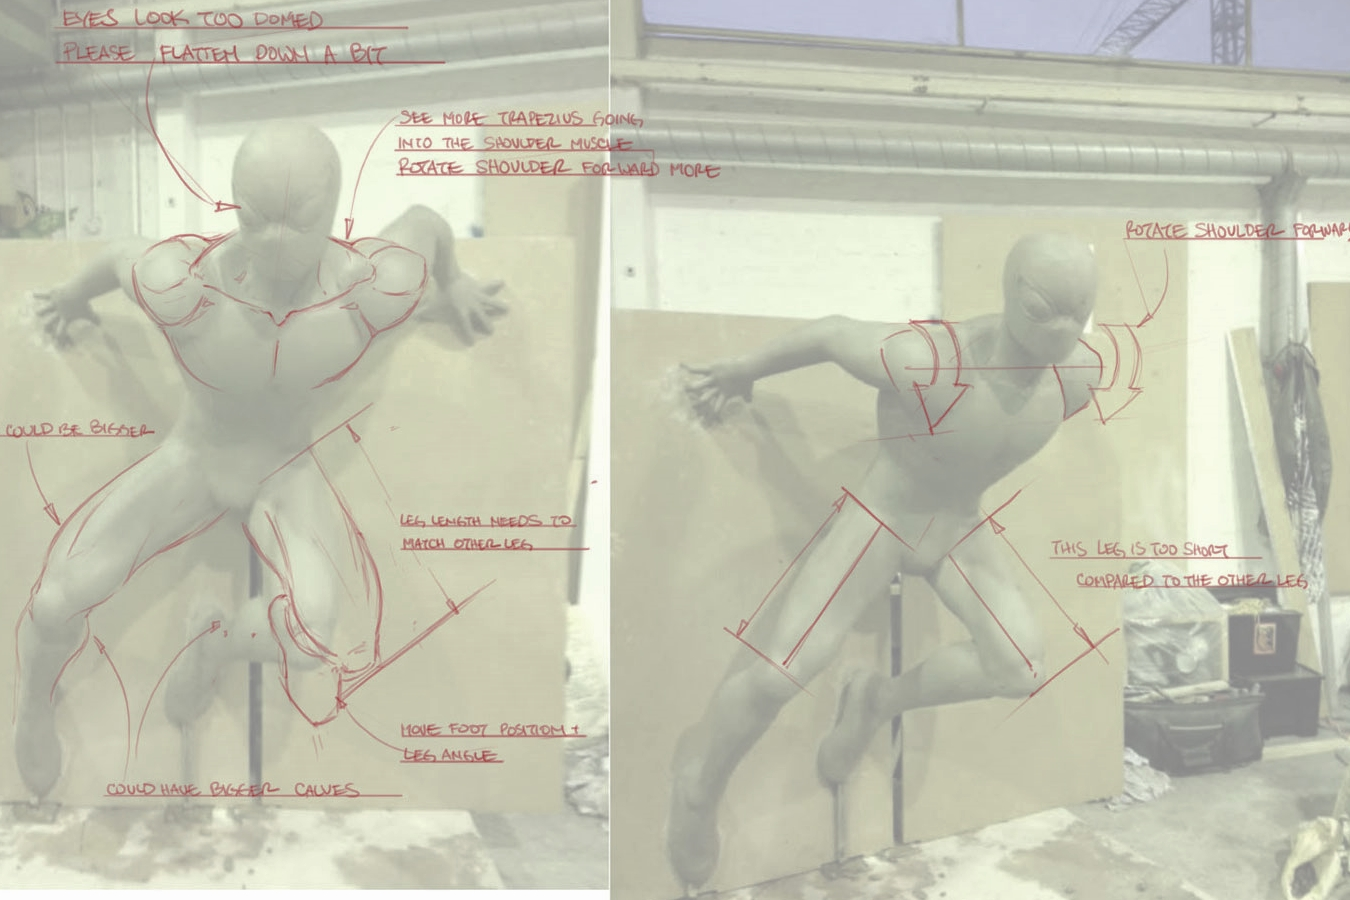 Propability-_Store-Development-_-Visual-Merchandise-and-Display-Solutions-_-Creative-Design-_-Build-&-Manufacture-_-Installation-_-Disney-Store-Paris-_-Spiderman-sketch.jpg